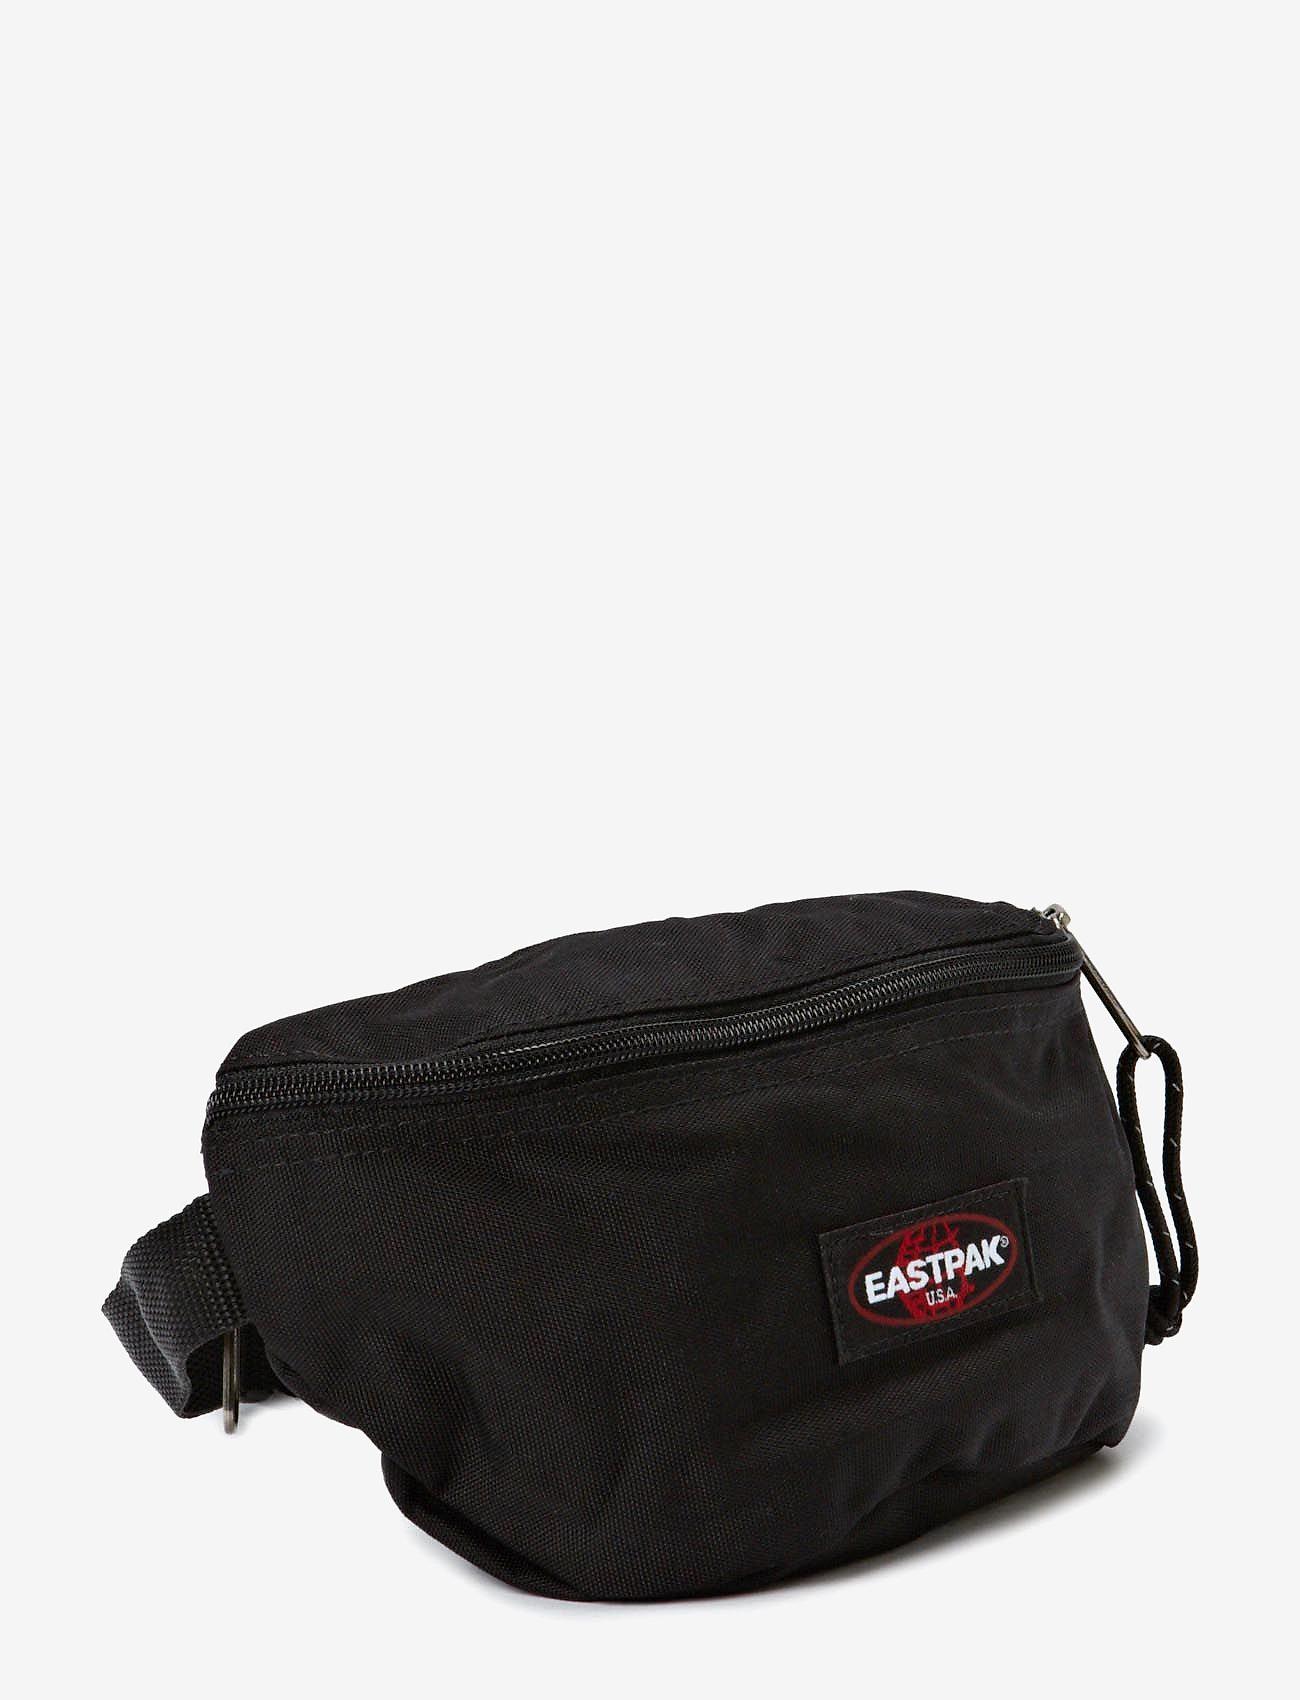 Eastpak - SPRINGER - bum bags - black - 1